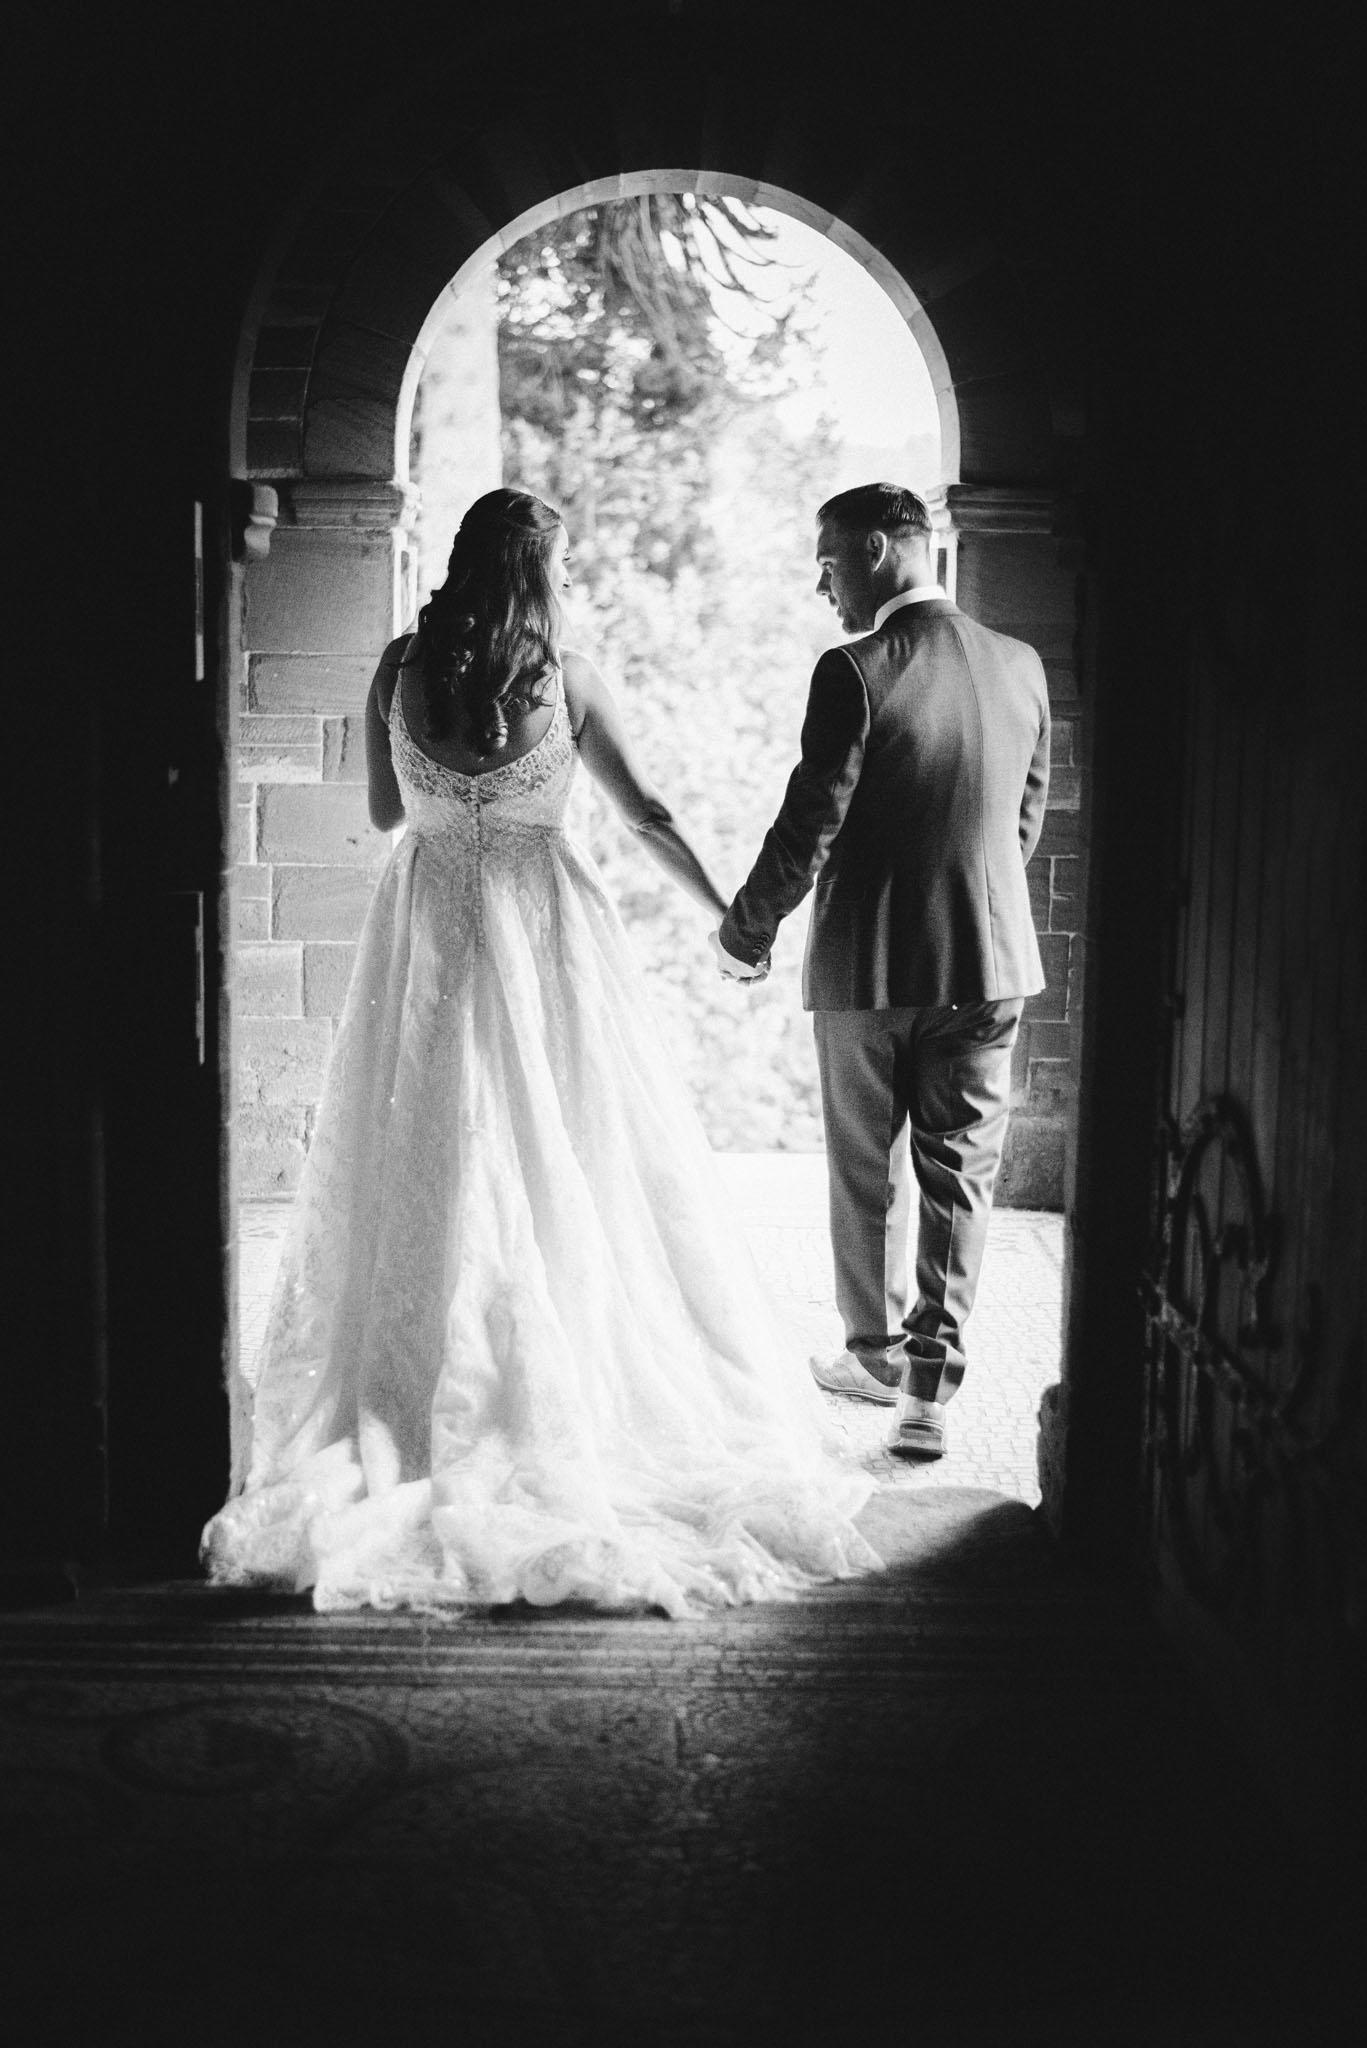 wedding-photographer-glewstone-court-hereford-scott-stockwell-photography230.jpg